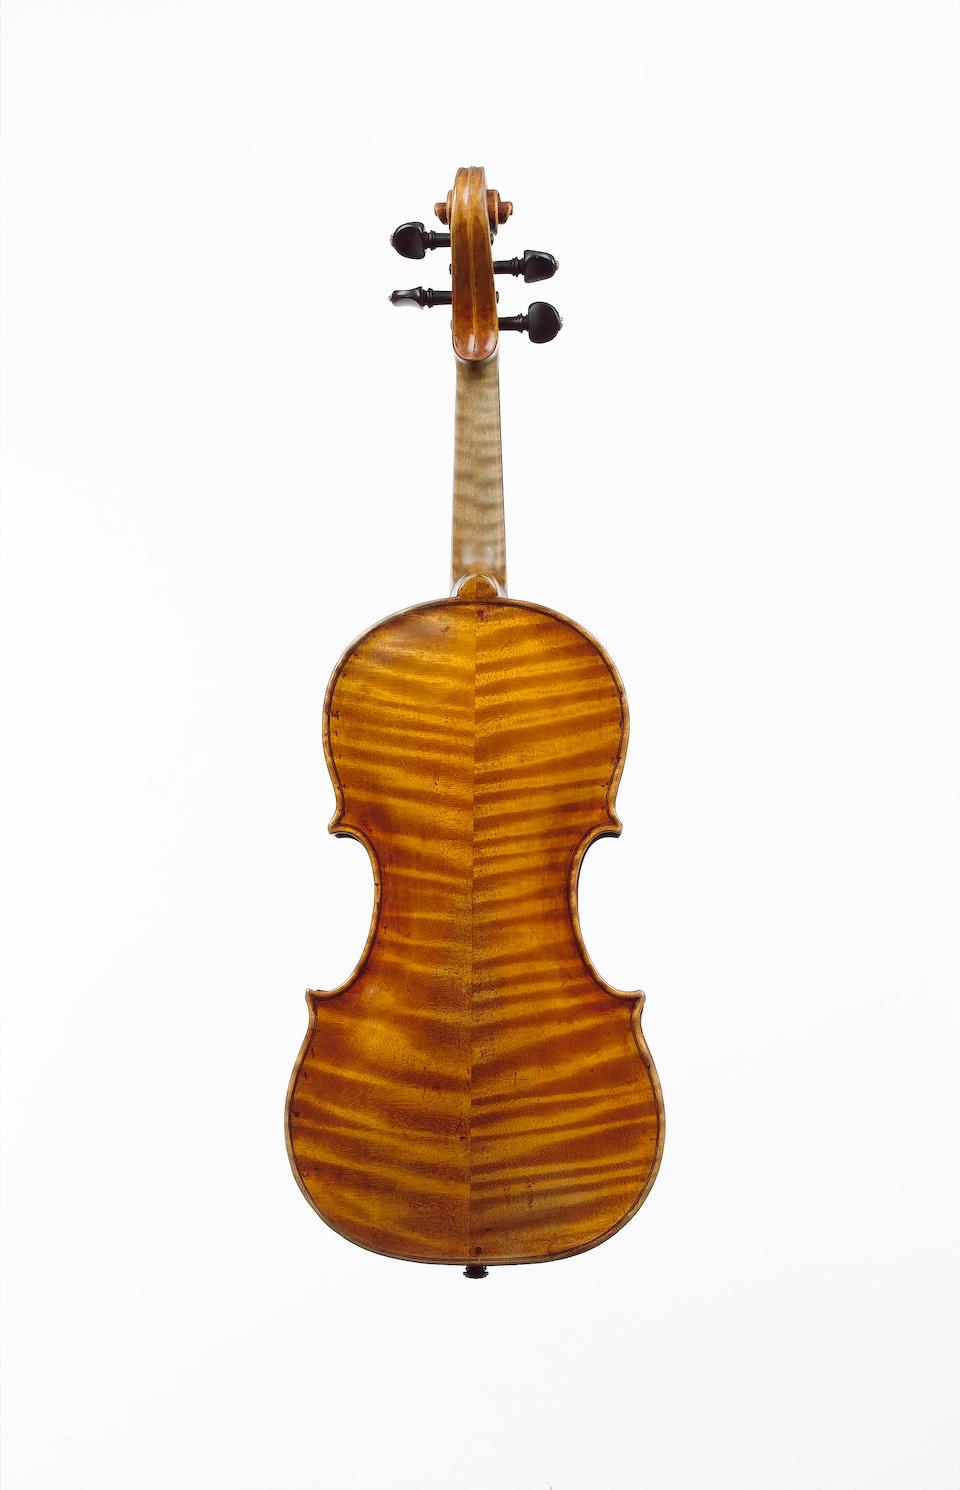 An Italian Violin circa 1710, probably by Petrus Guarnerius, Mantua